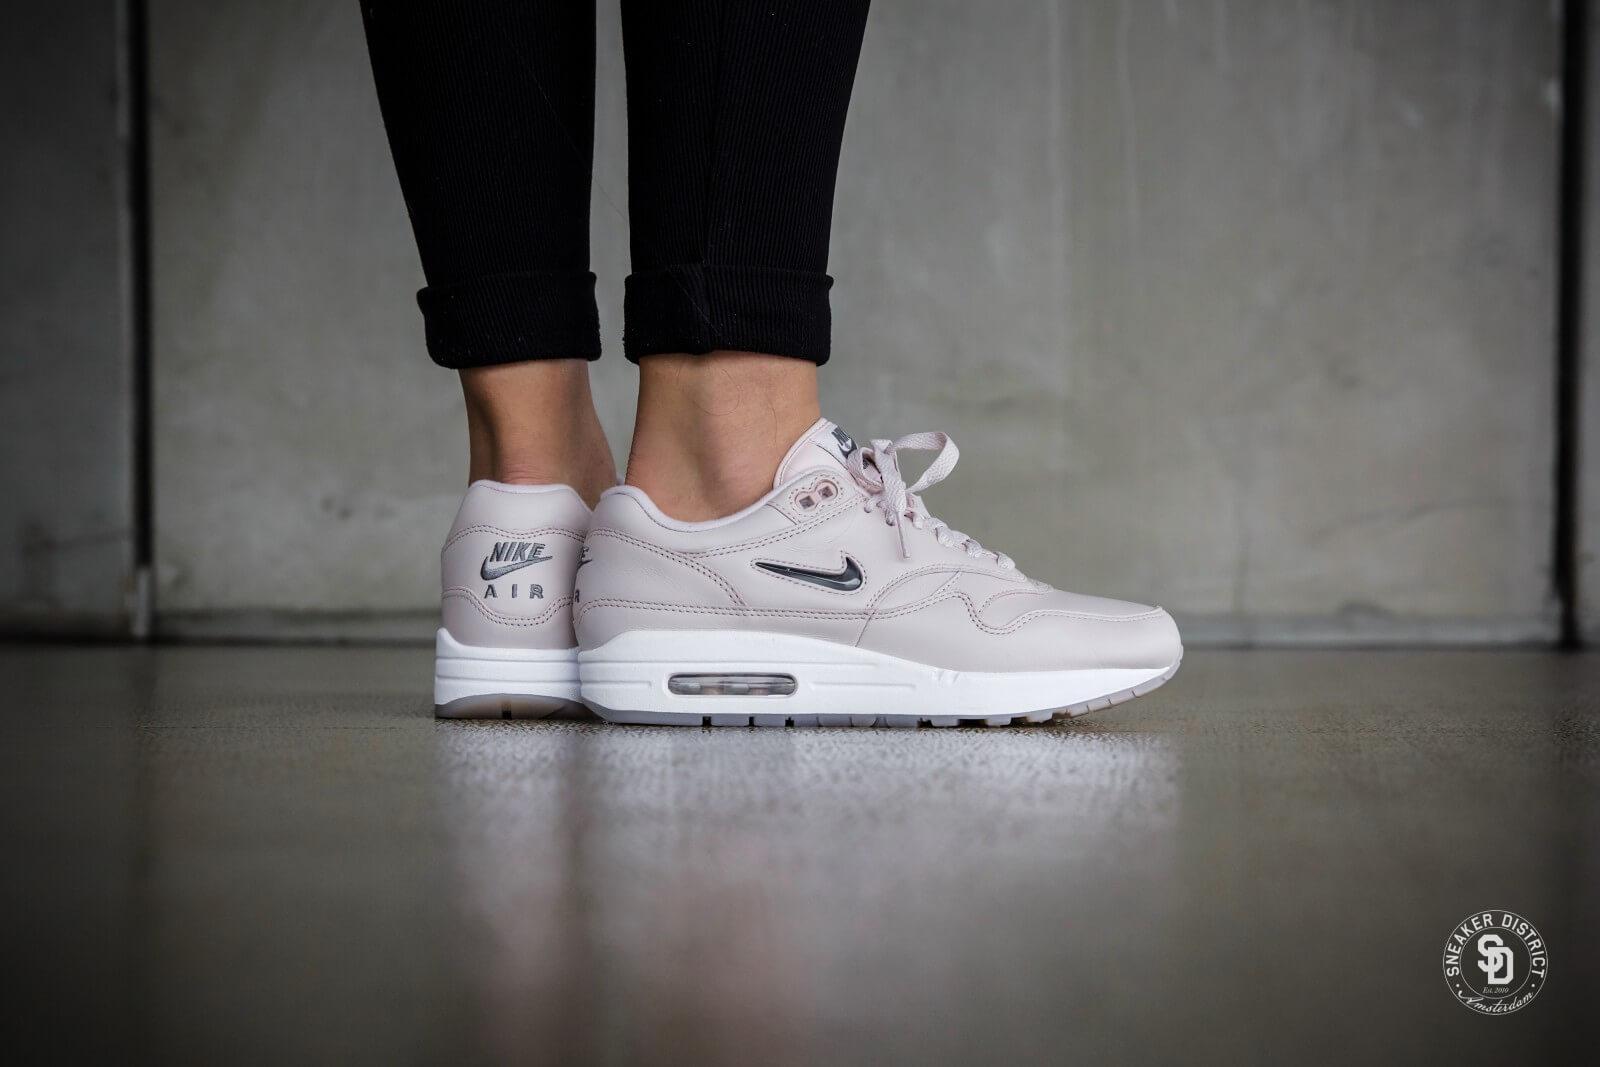 Nike Air Max 1 Premium SC Jewel White Wmn's